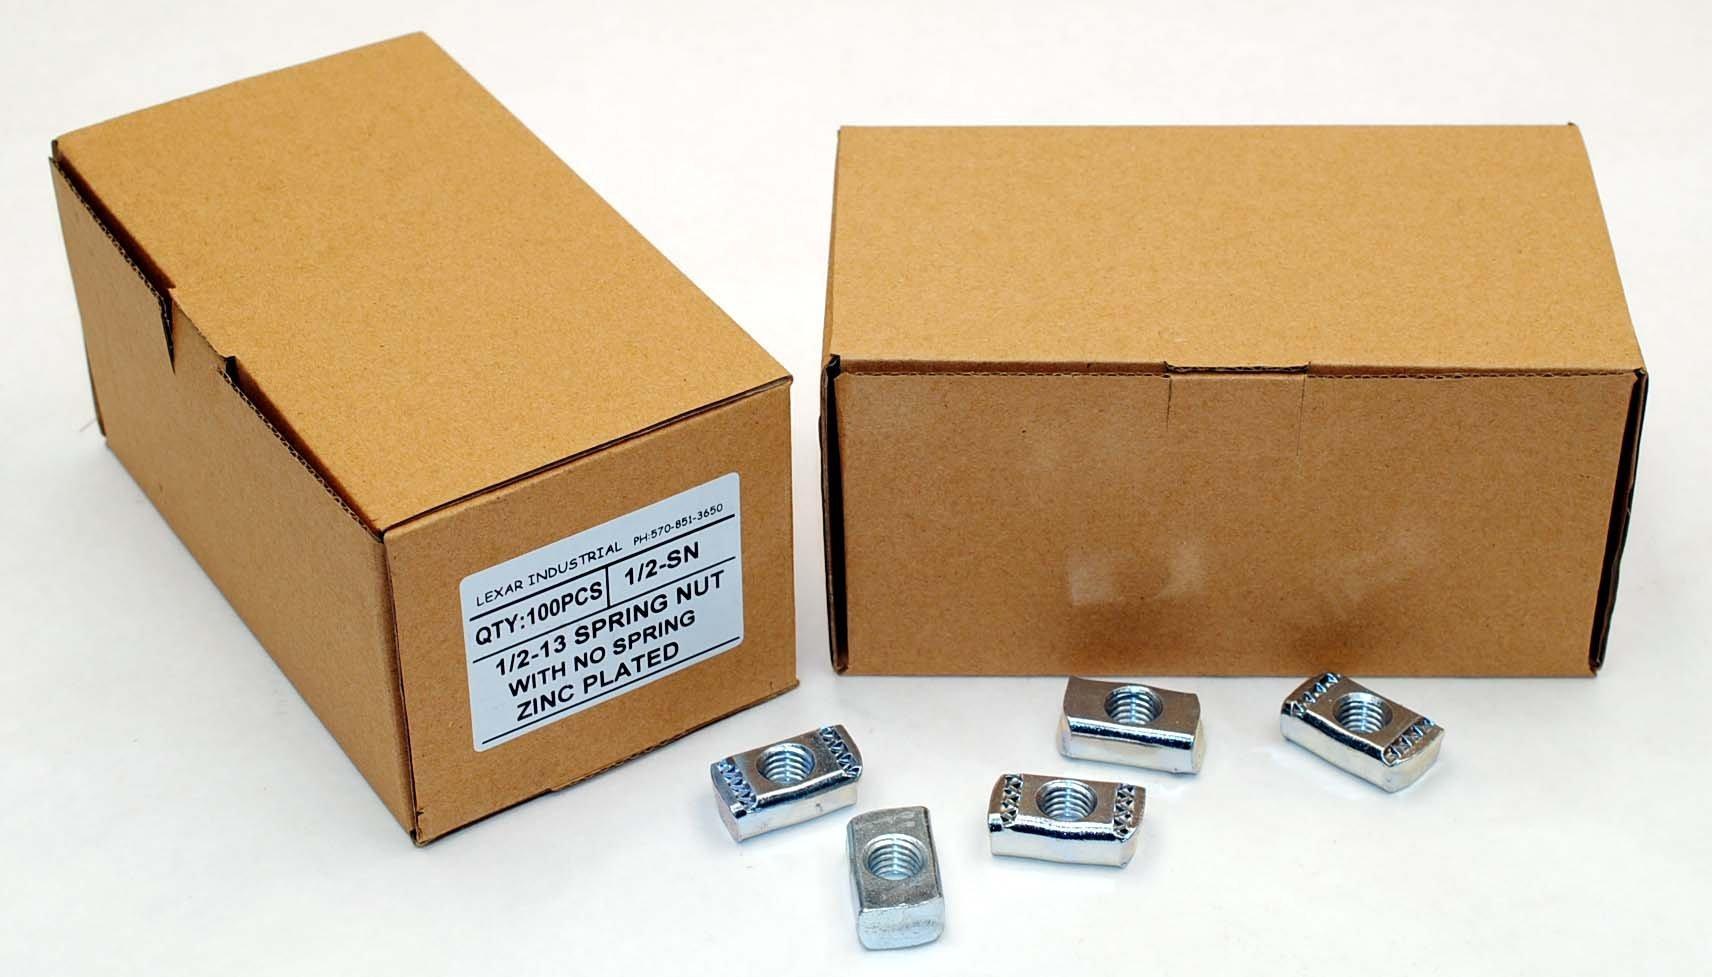 (100) Strut Channel Nuts 1/2-13 No Spring Zinc Plated Unistrut Nut by Lexar Industrial